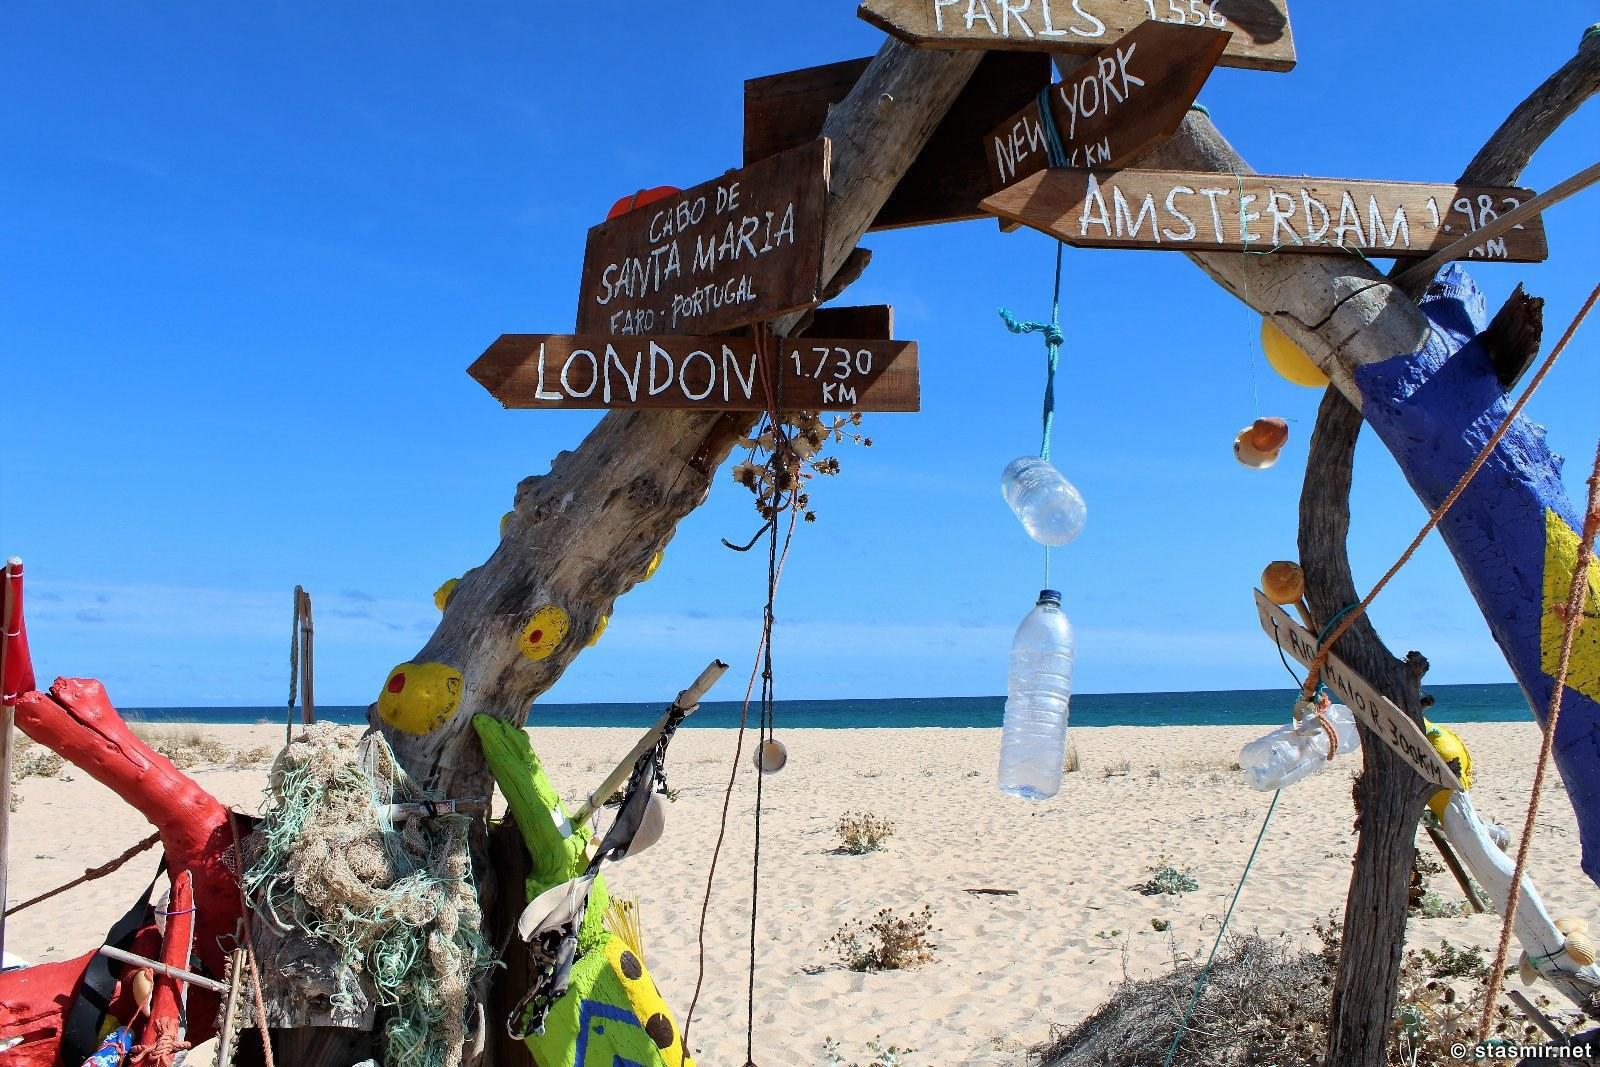 Указатели до европейских столиц на пляже на необитаемом острое на Риу Формоза в Алгарве, Португалия, фото Стасмир, photo Stasmir